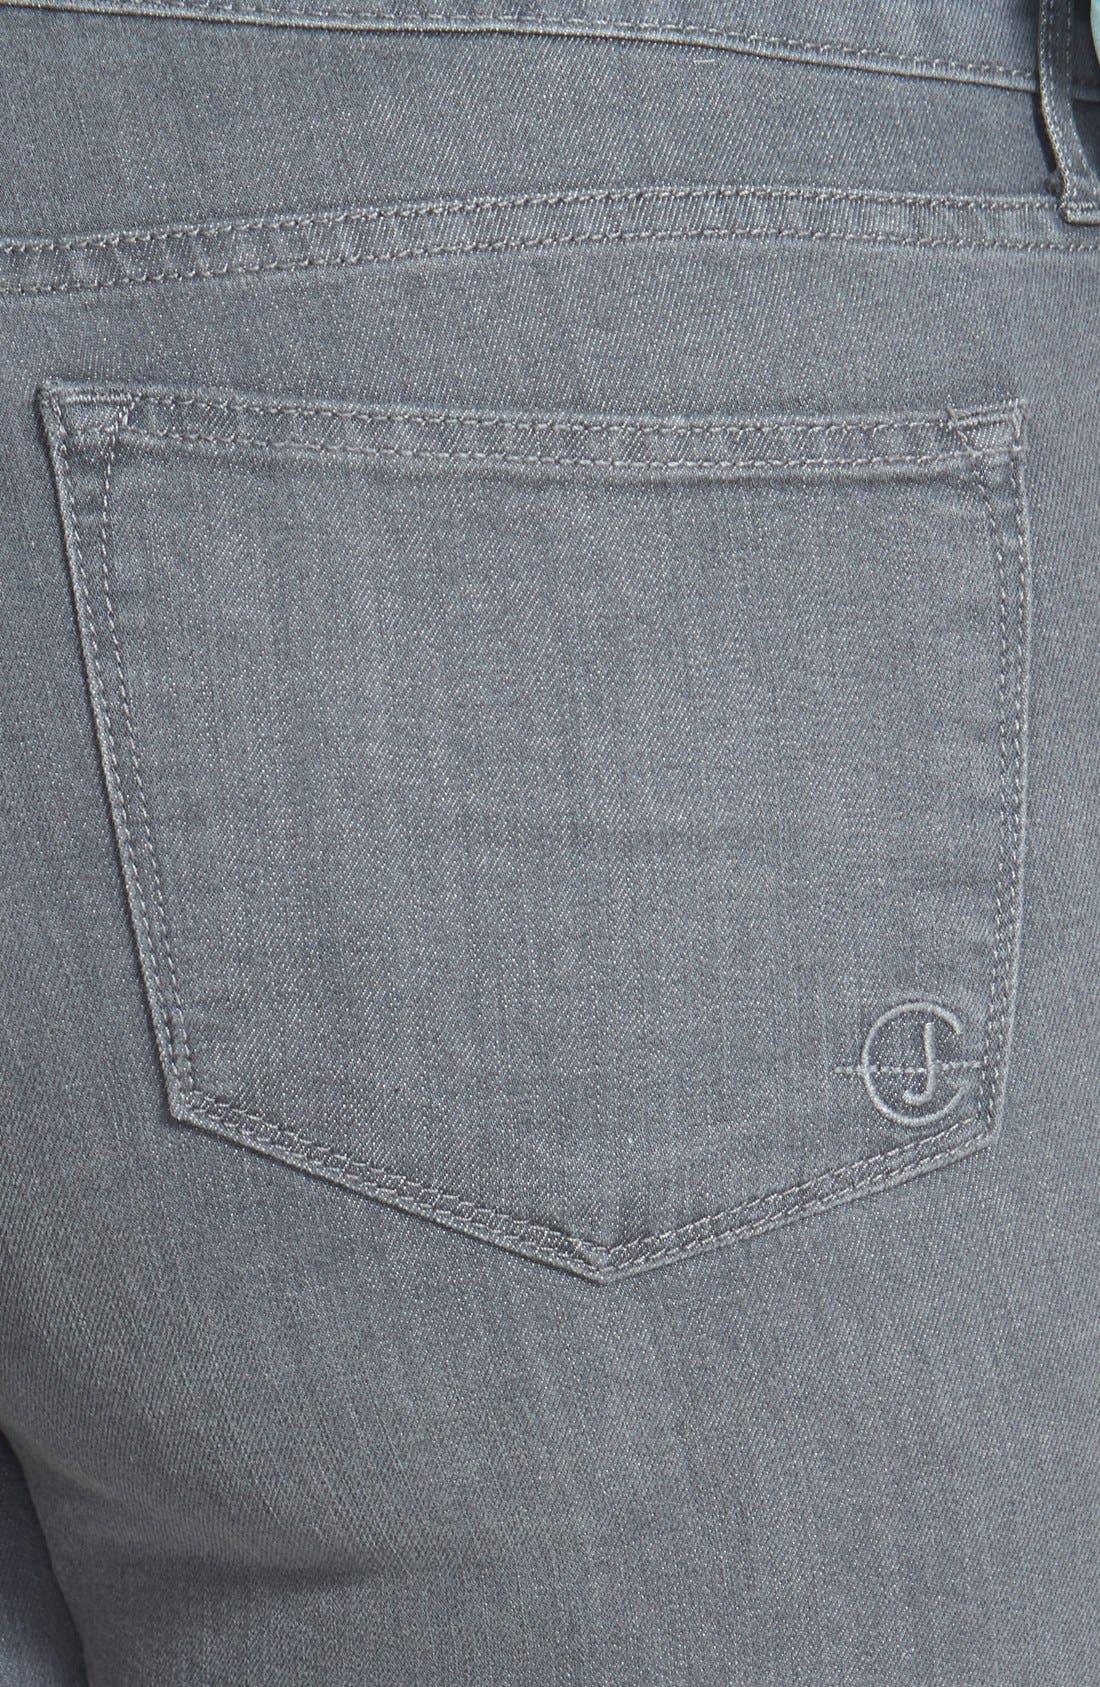 Alternate Image 3  - CJ by Cookie Johnson 'Faith' Stretch Straight Leg Jeans (Plus Size)